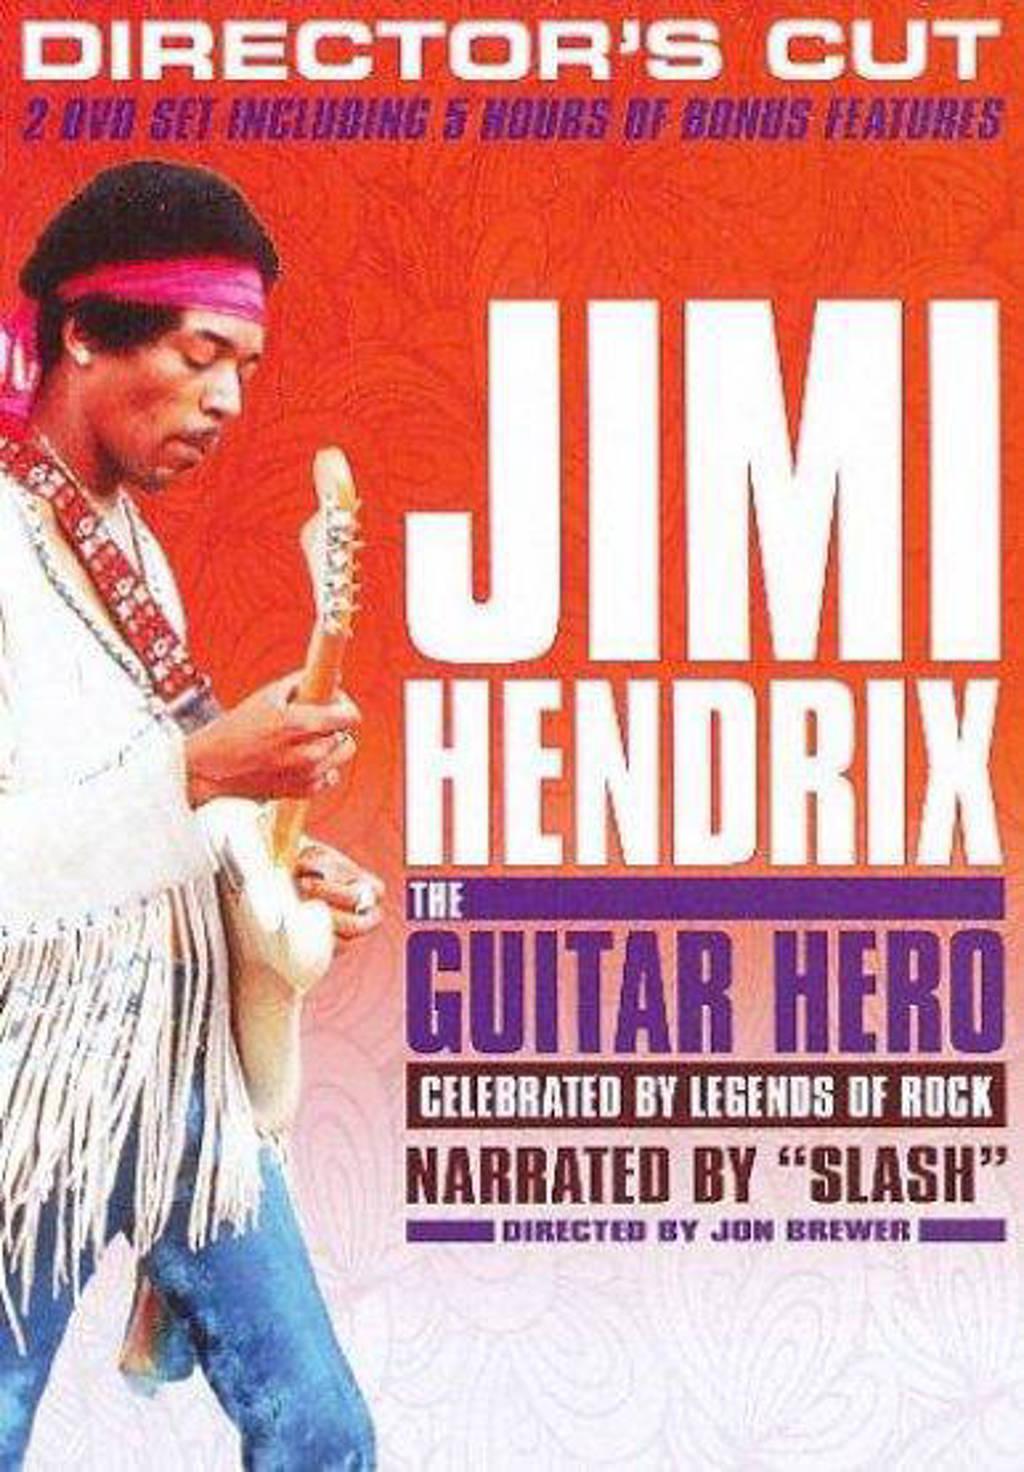 Jimi Hendrix - The Guitar Hero (DVD)